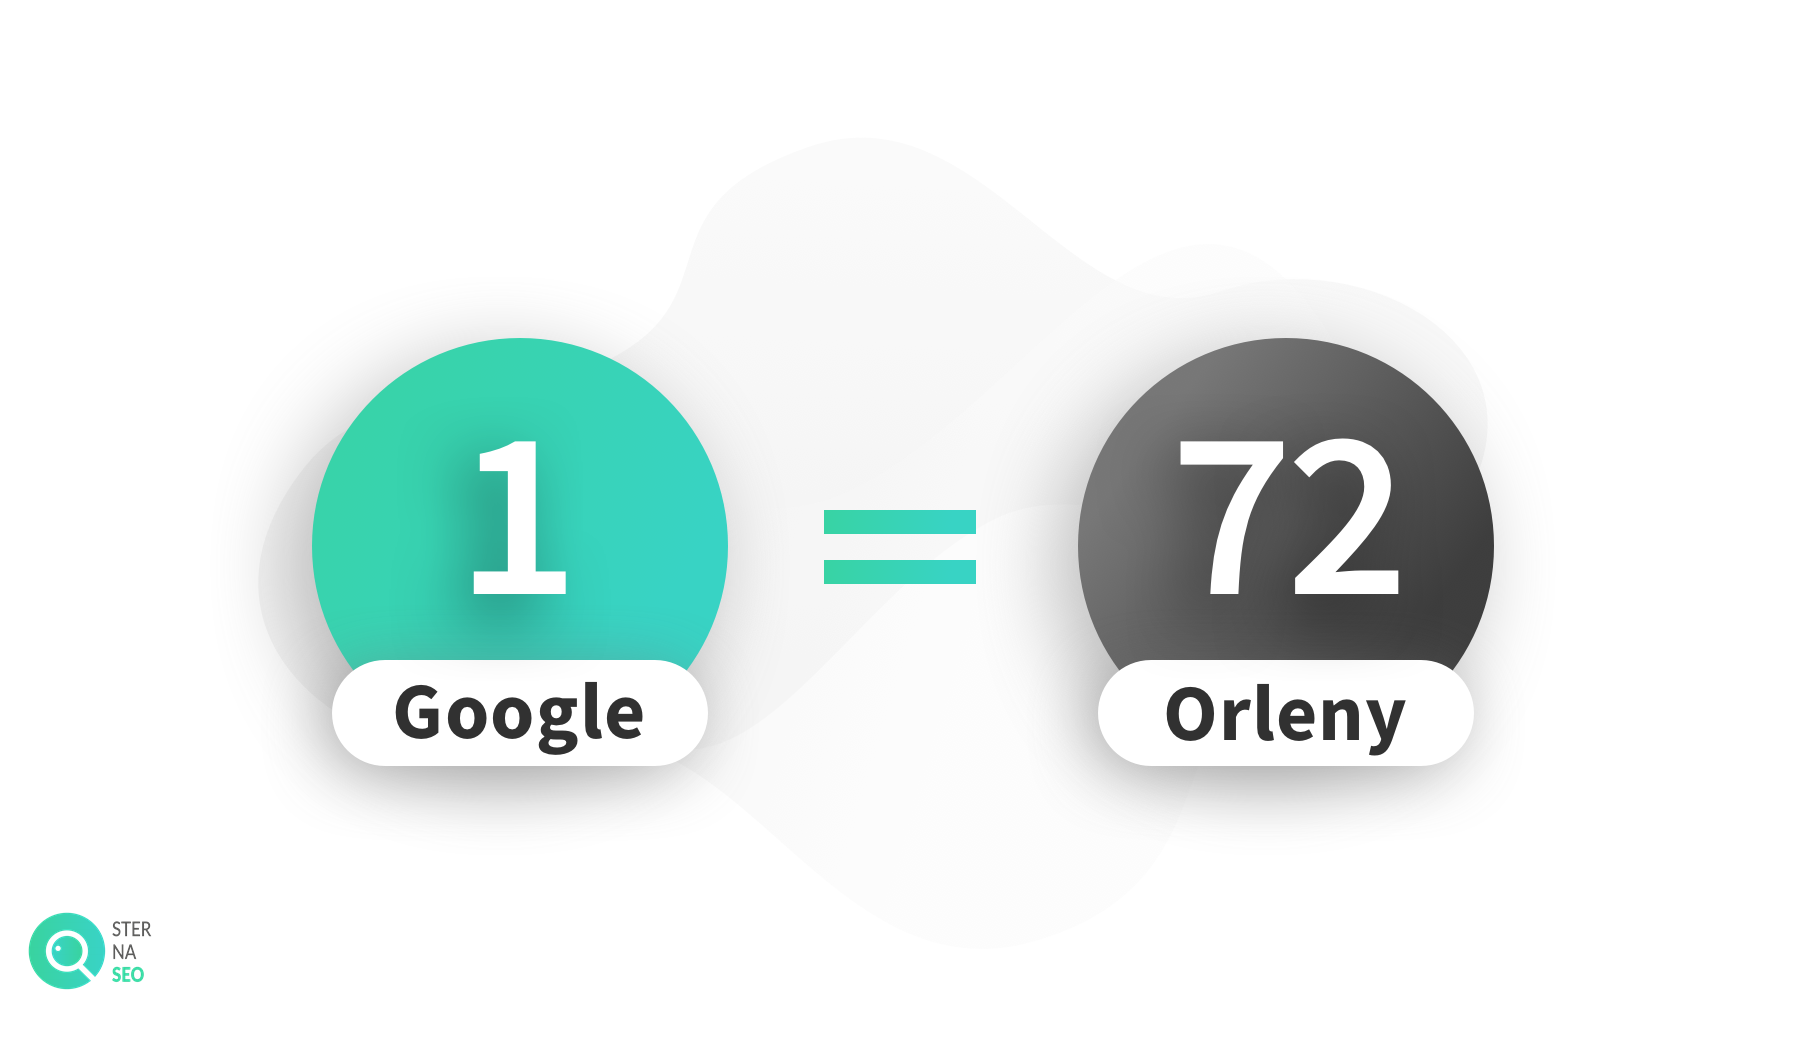 Ile spółek Orlen równoważy Google